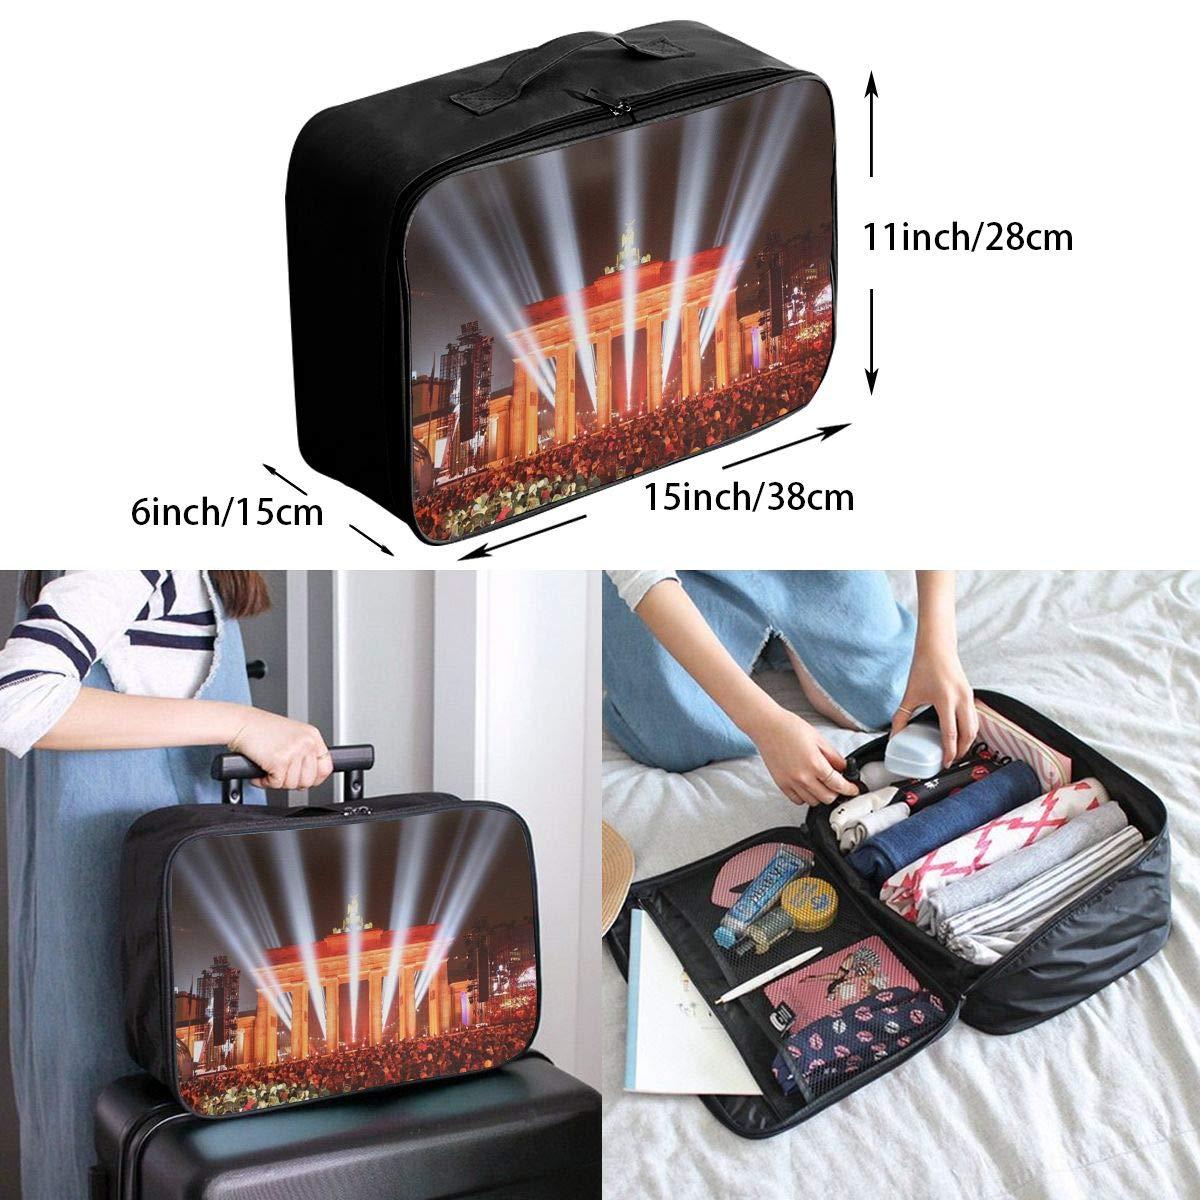 Travel Luggage Duffle Bag Lightweight Portable Handbag Brandenburg Gate Large Capacity Waterproof Foldable Storage Tote